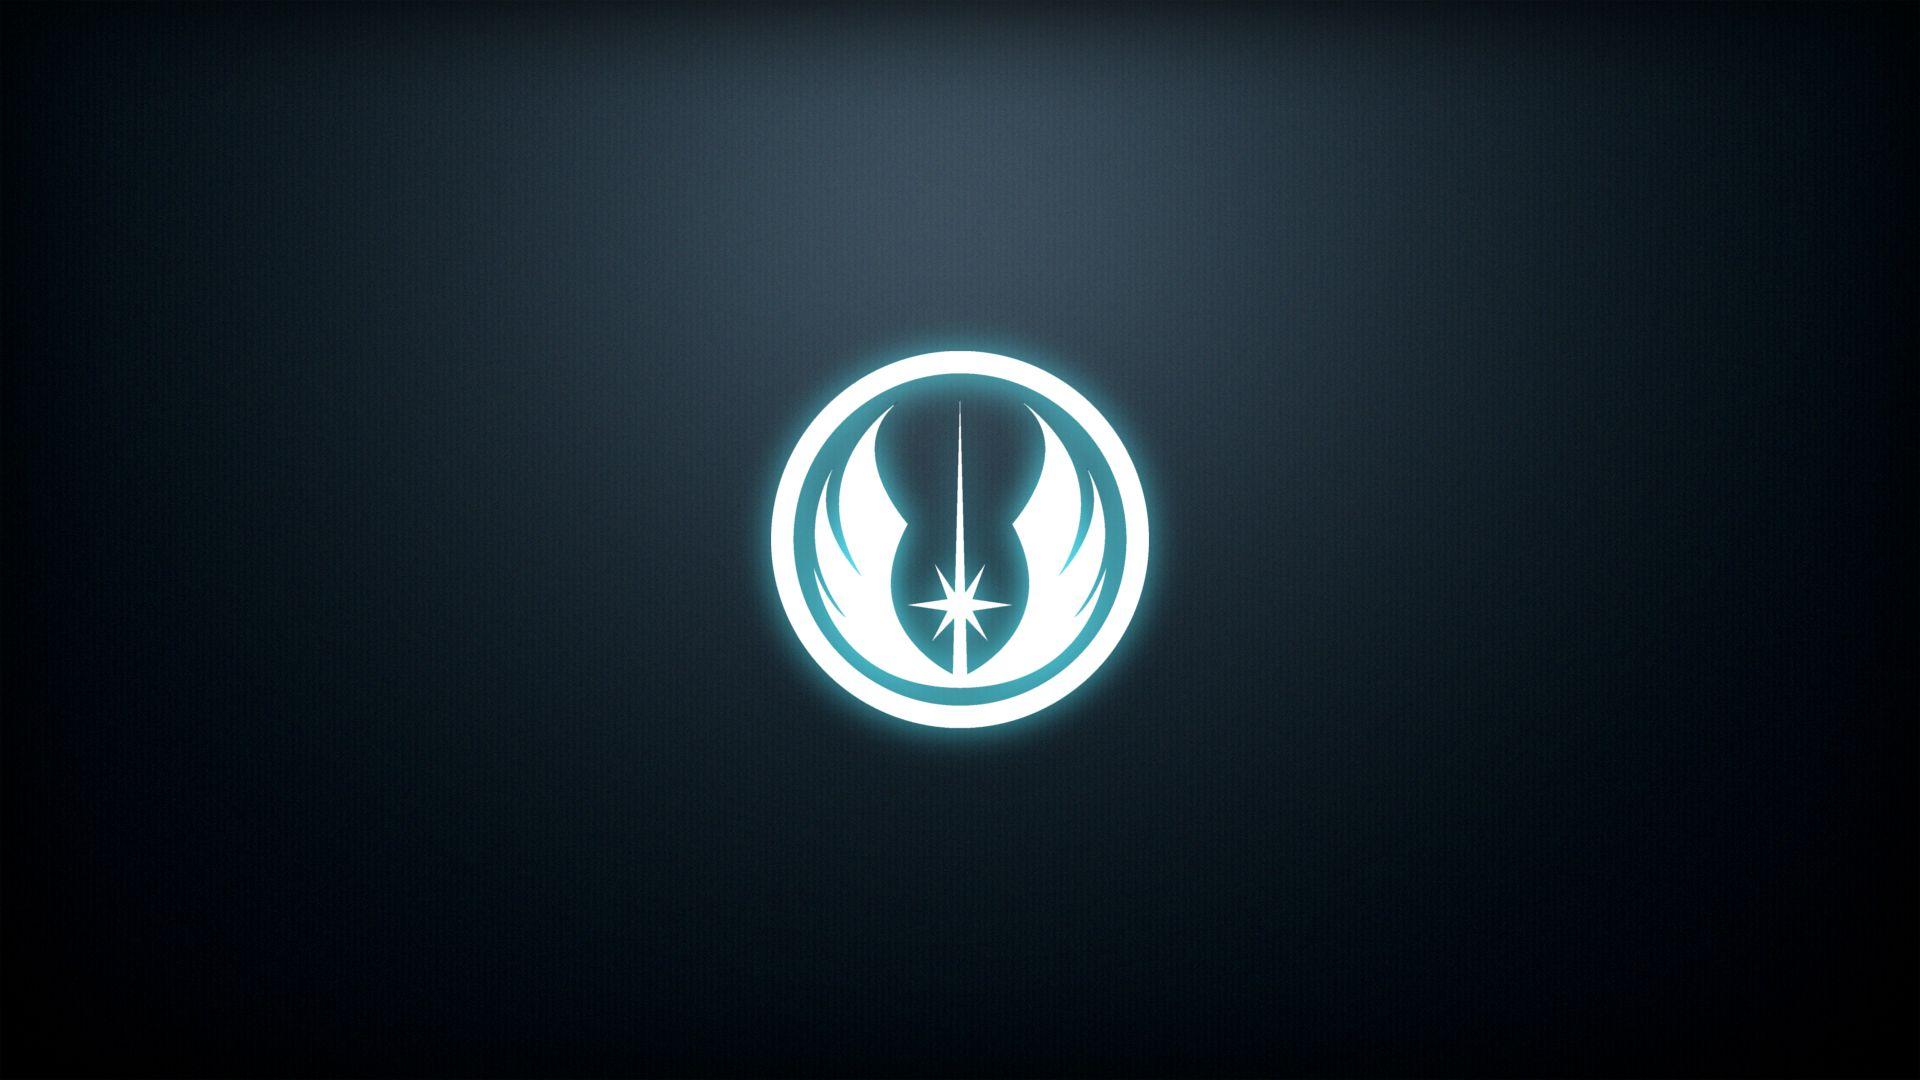 Jedi Order emblem that I made [1920x1080] Wallpaper Wallpapers 1920x1080